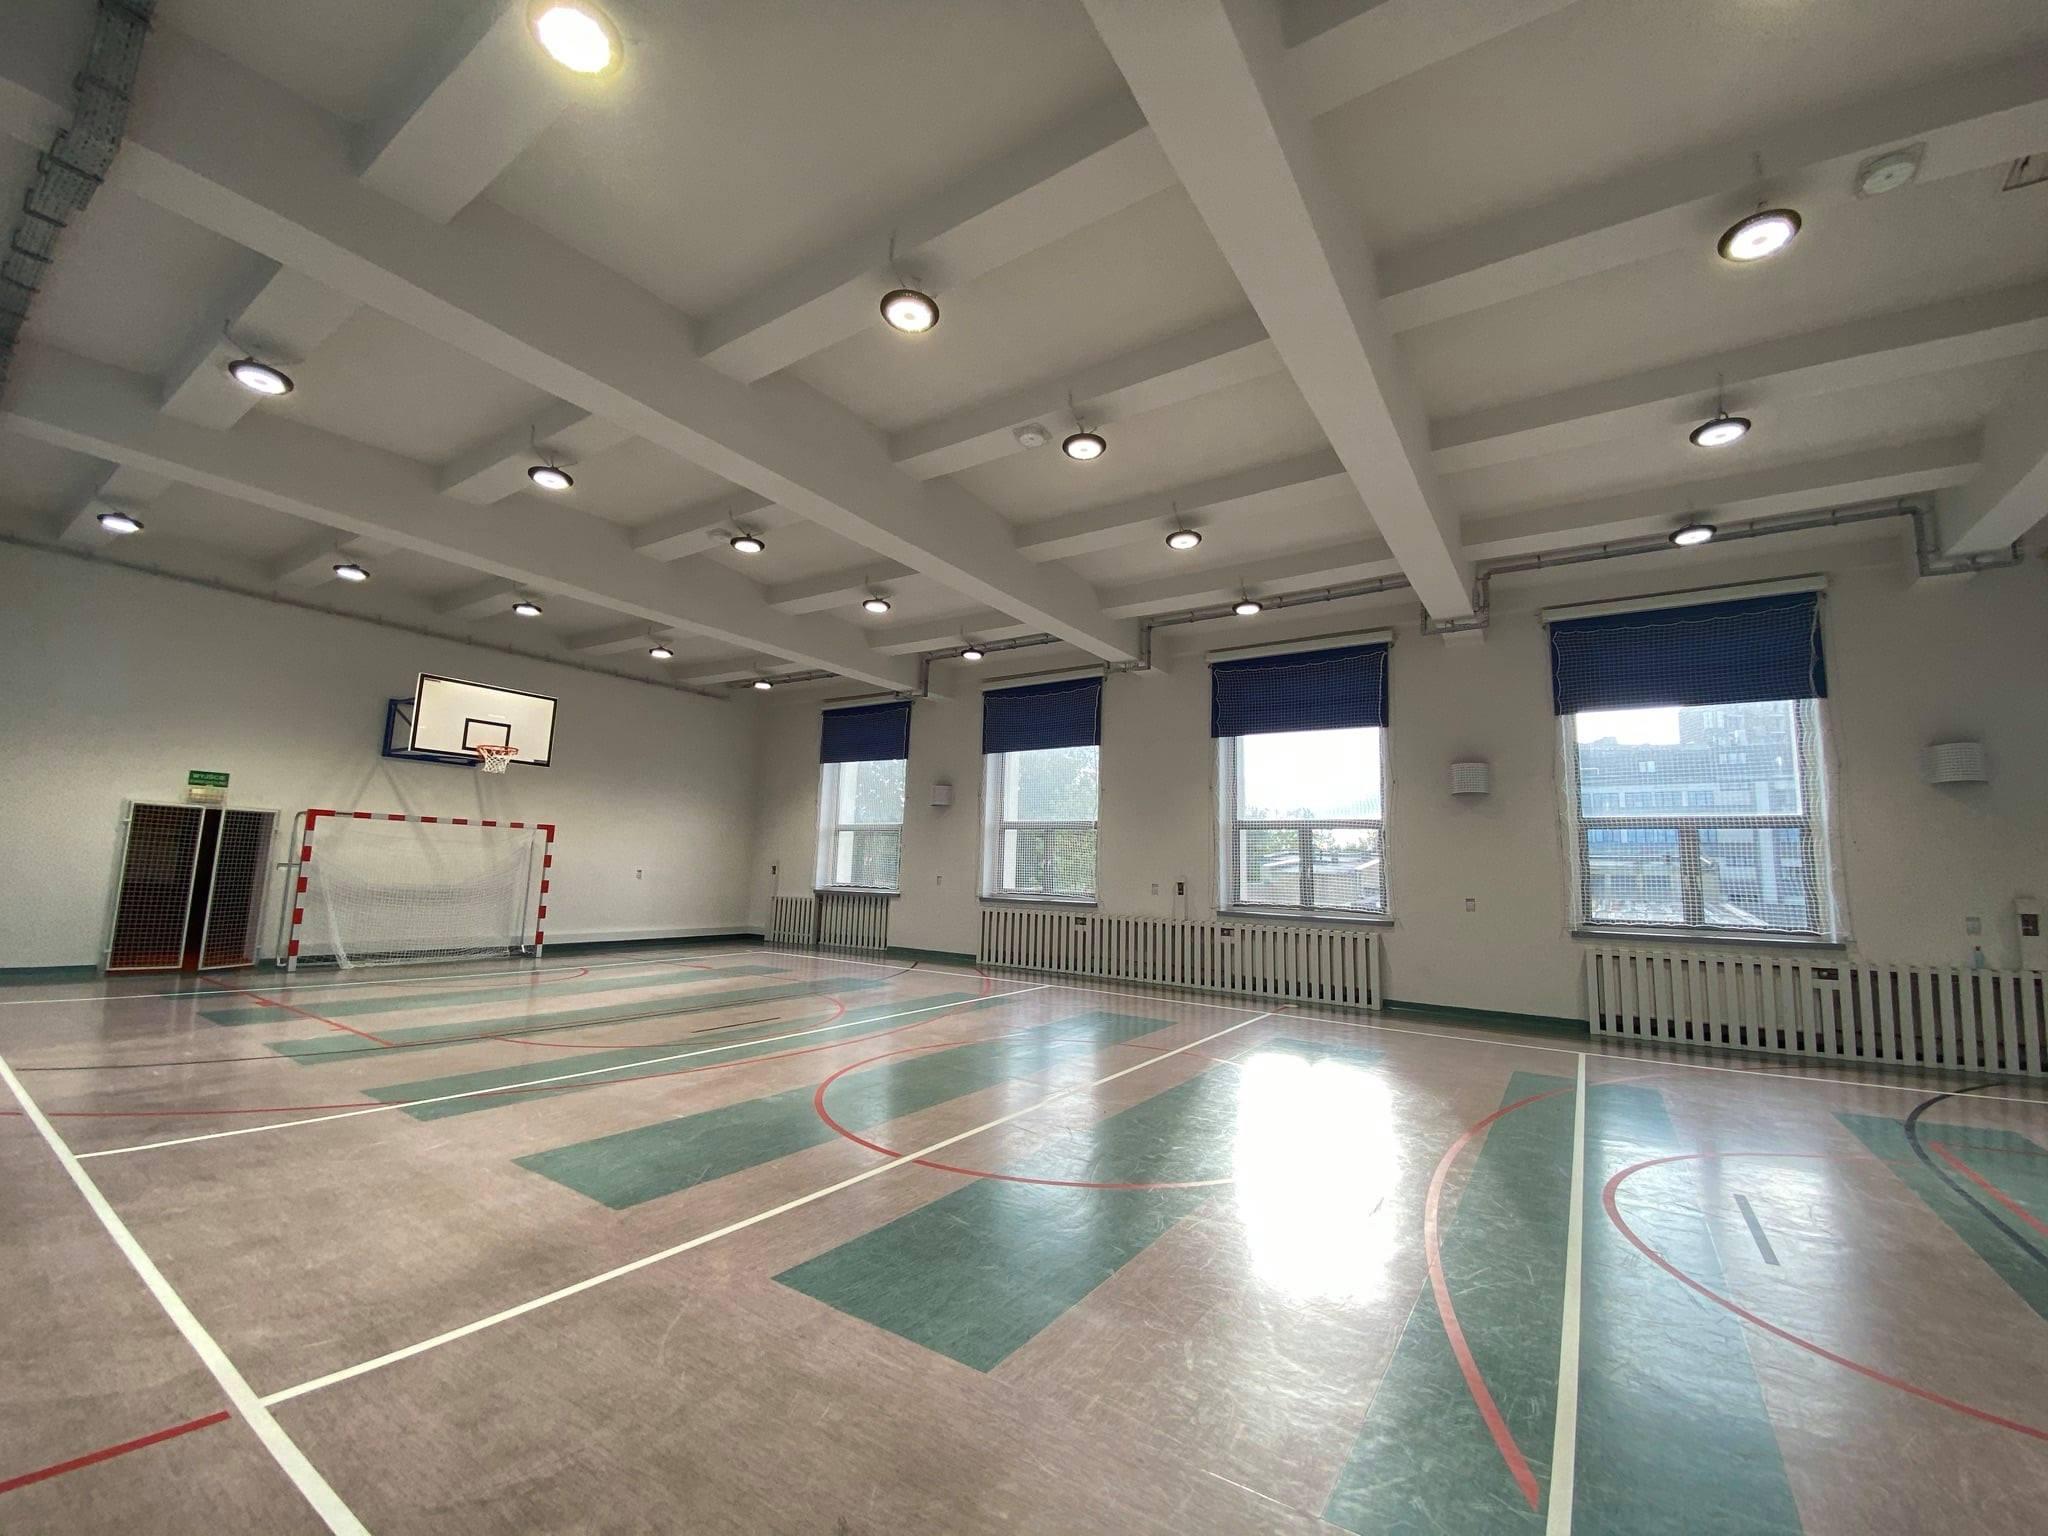 Sala do koszykówki